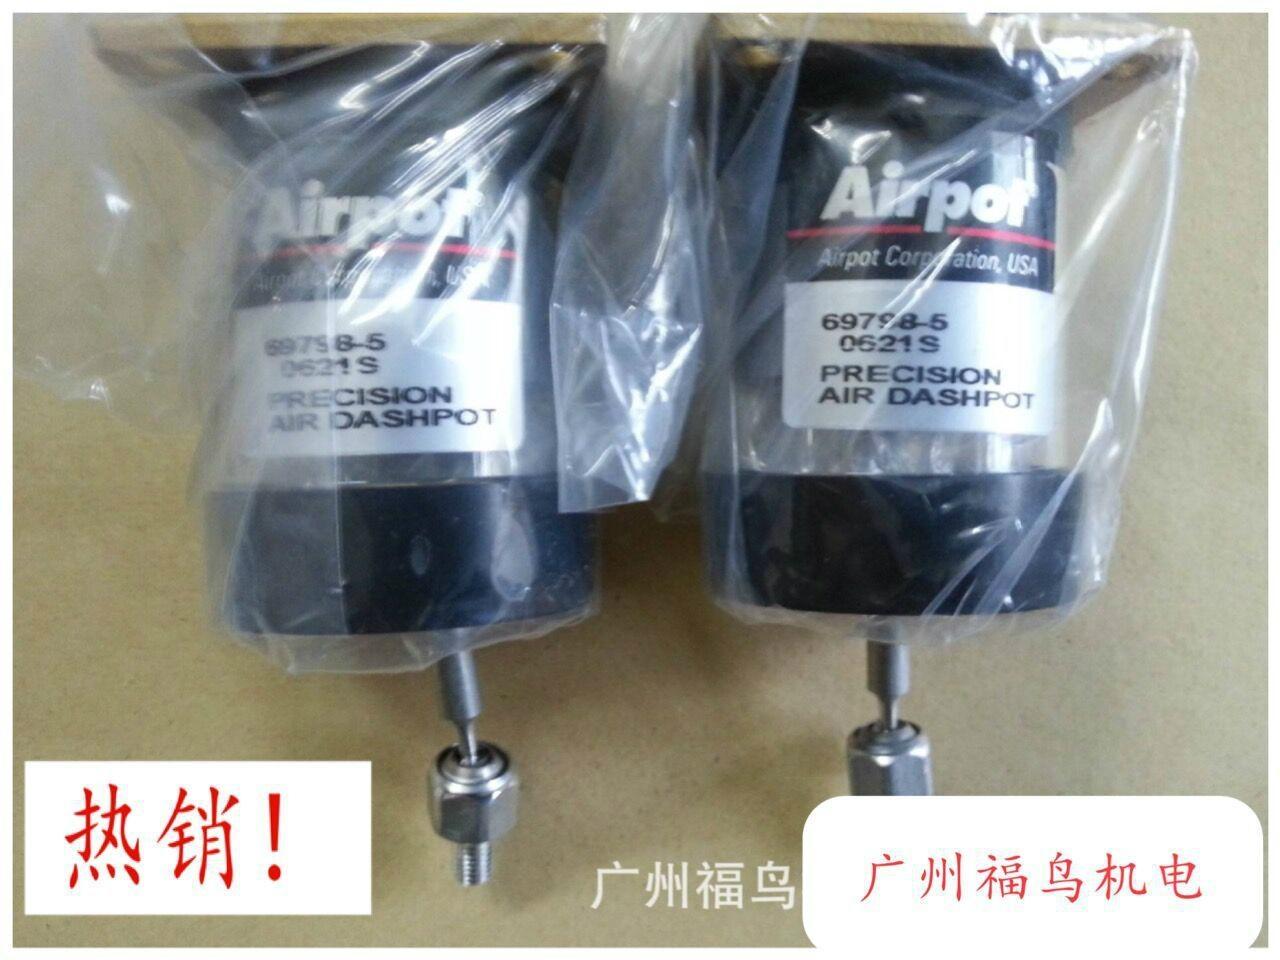 AIRPOT氣缸, 阻尼器 型號: 69798-5